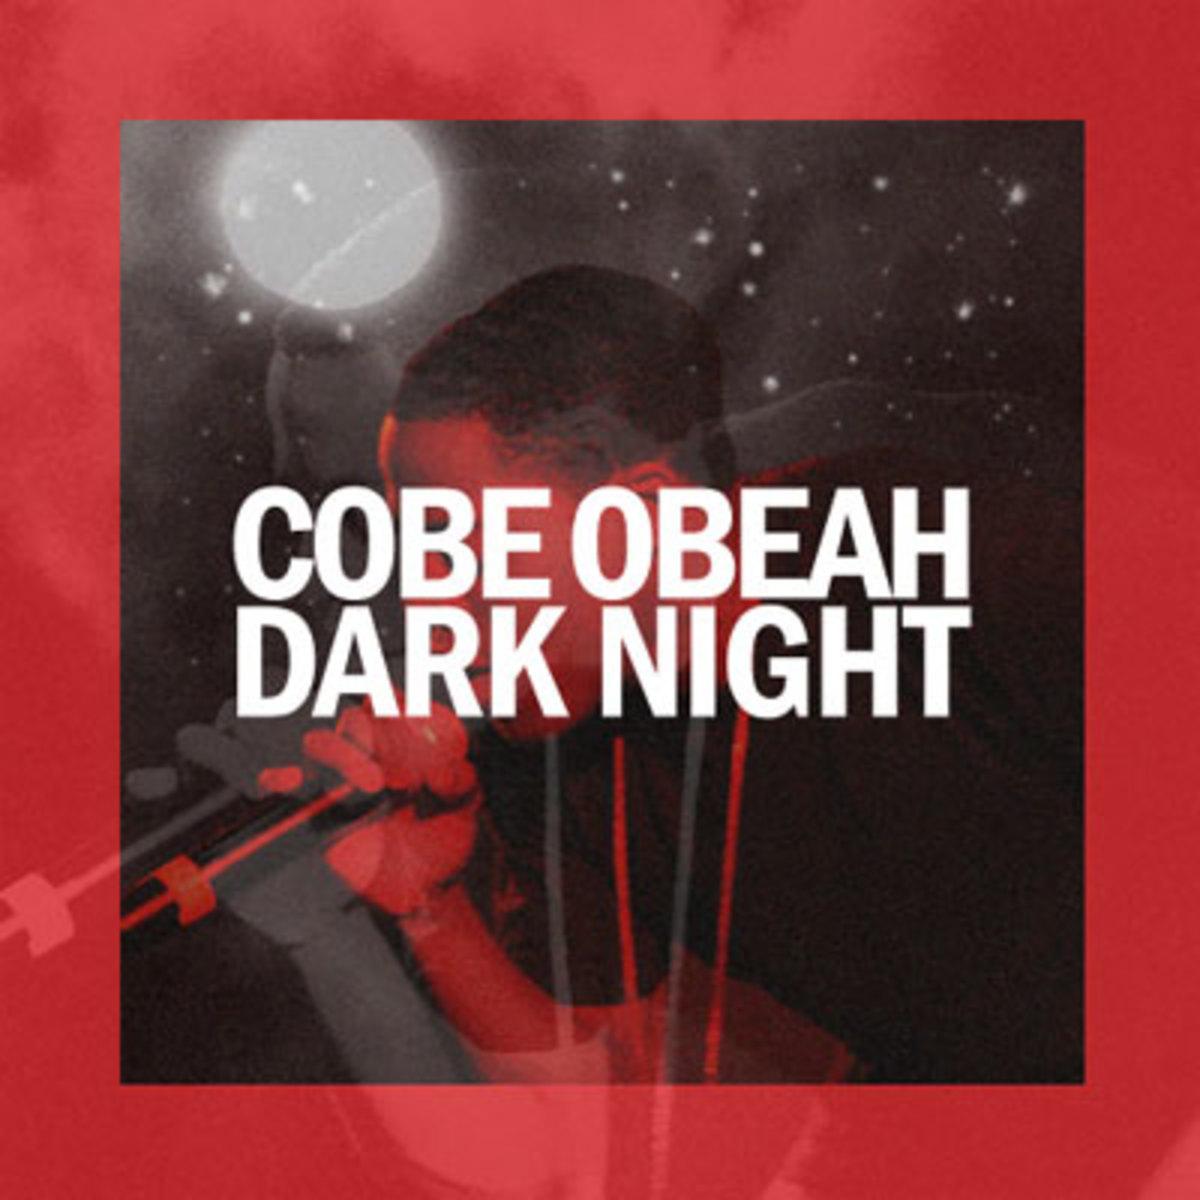 cobeobeah-darknight.jpg